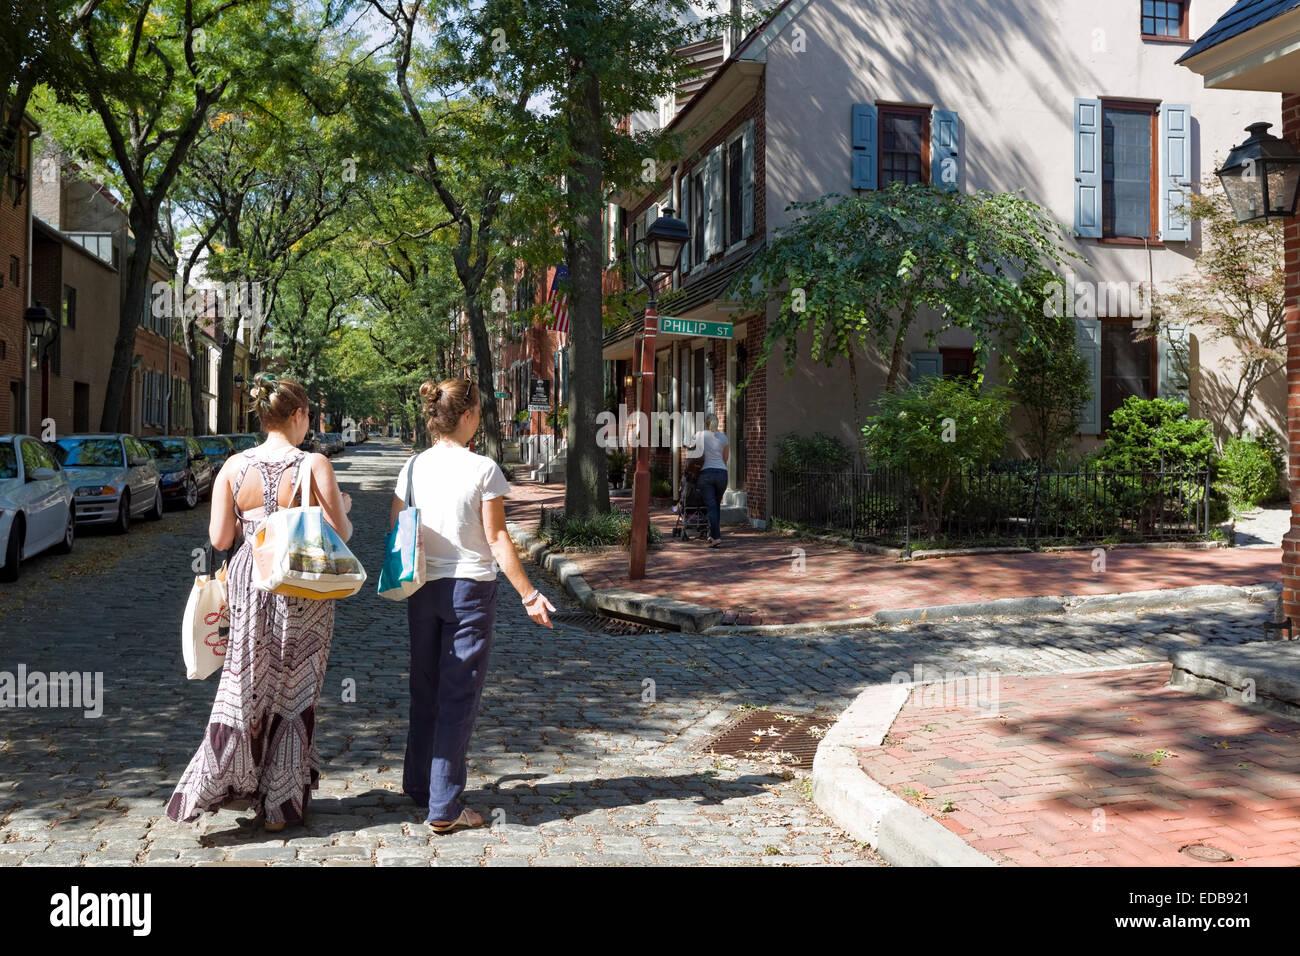 Historic Neighborhood, Philadelphia, Pennsylvania - Stock Image